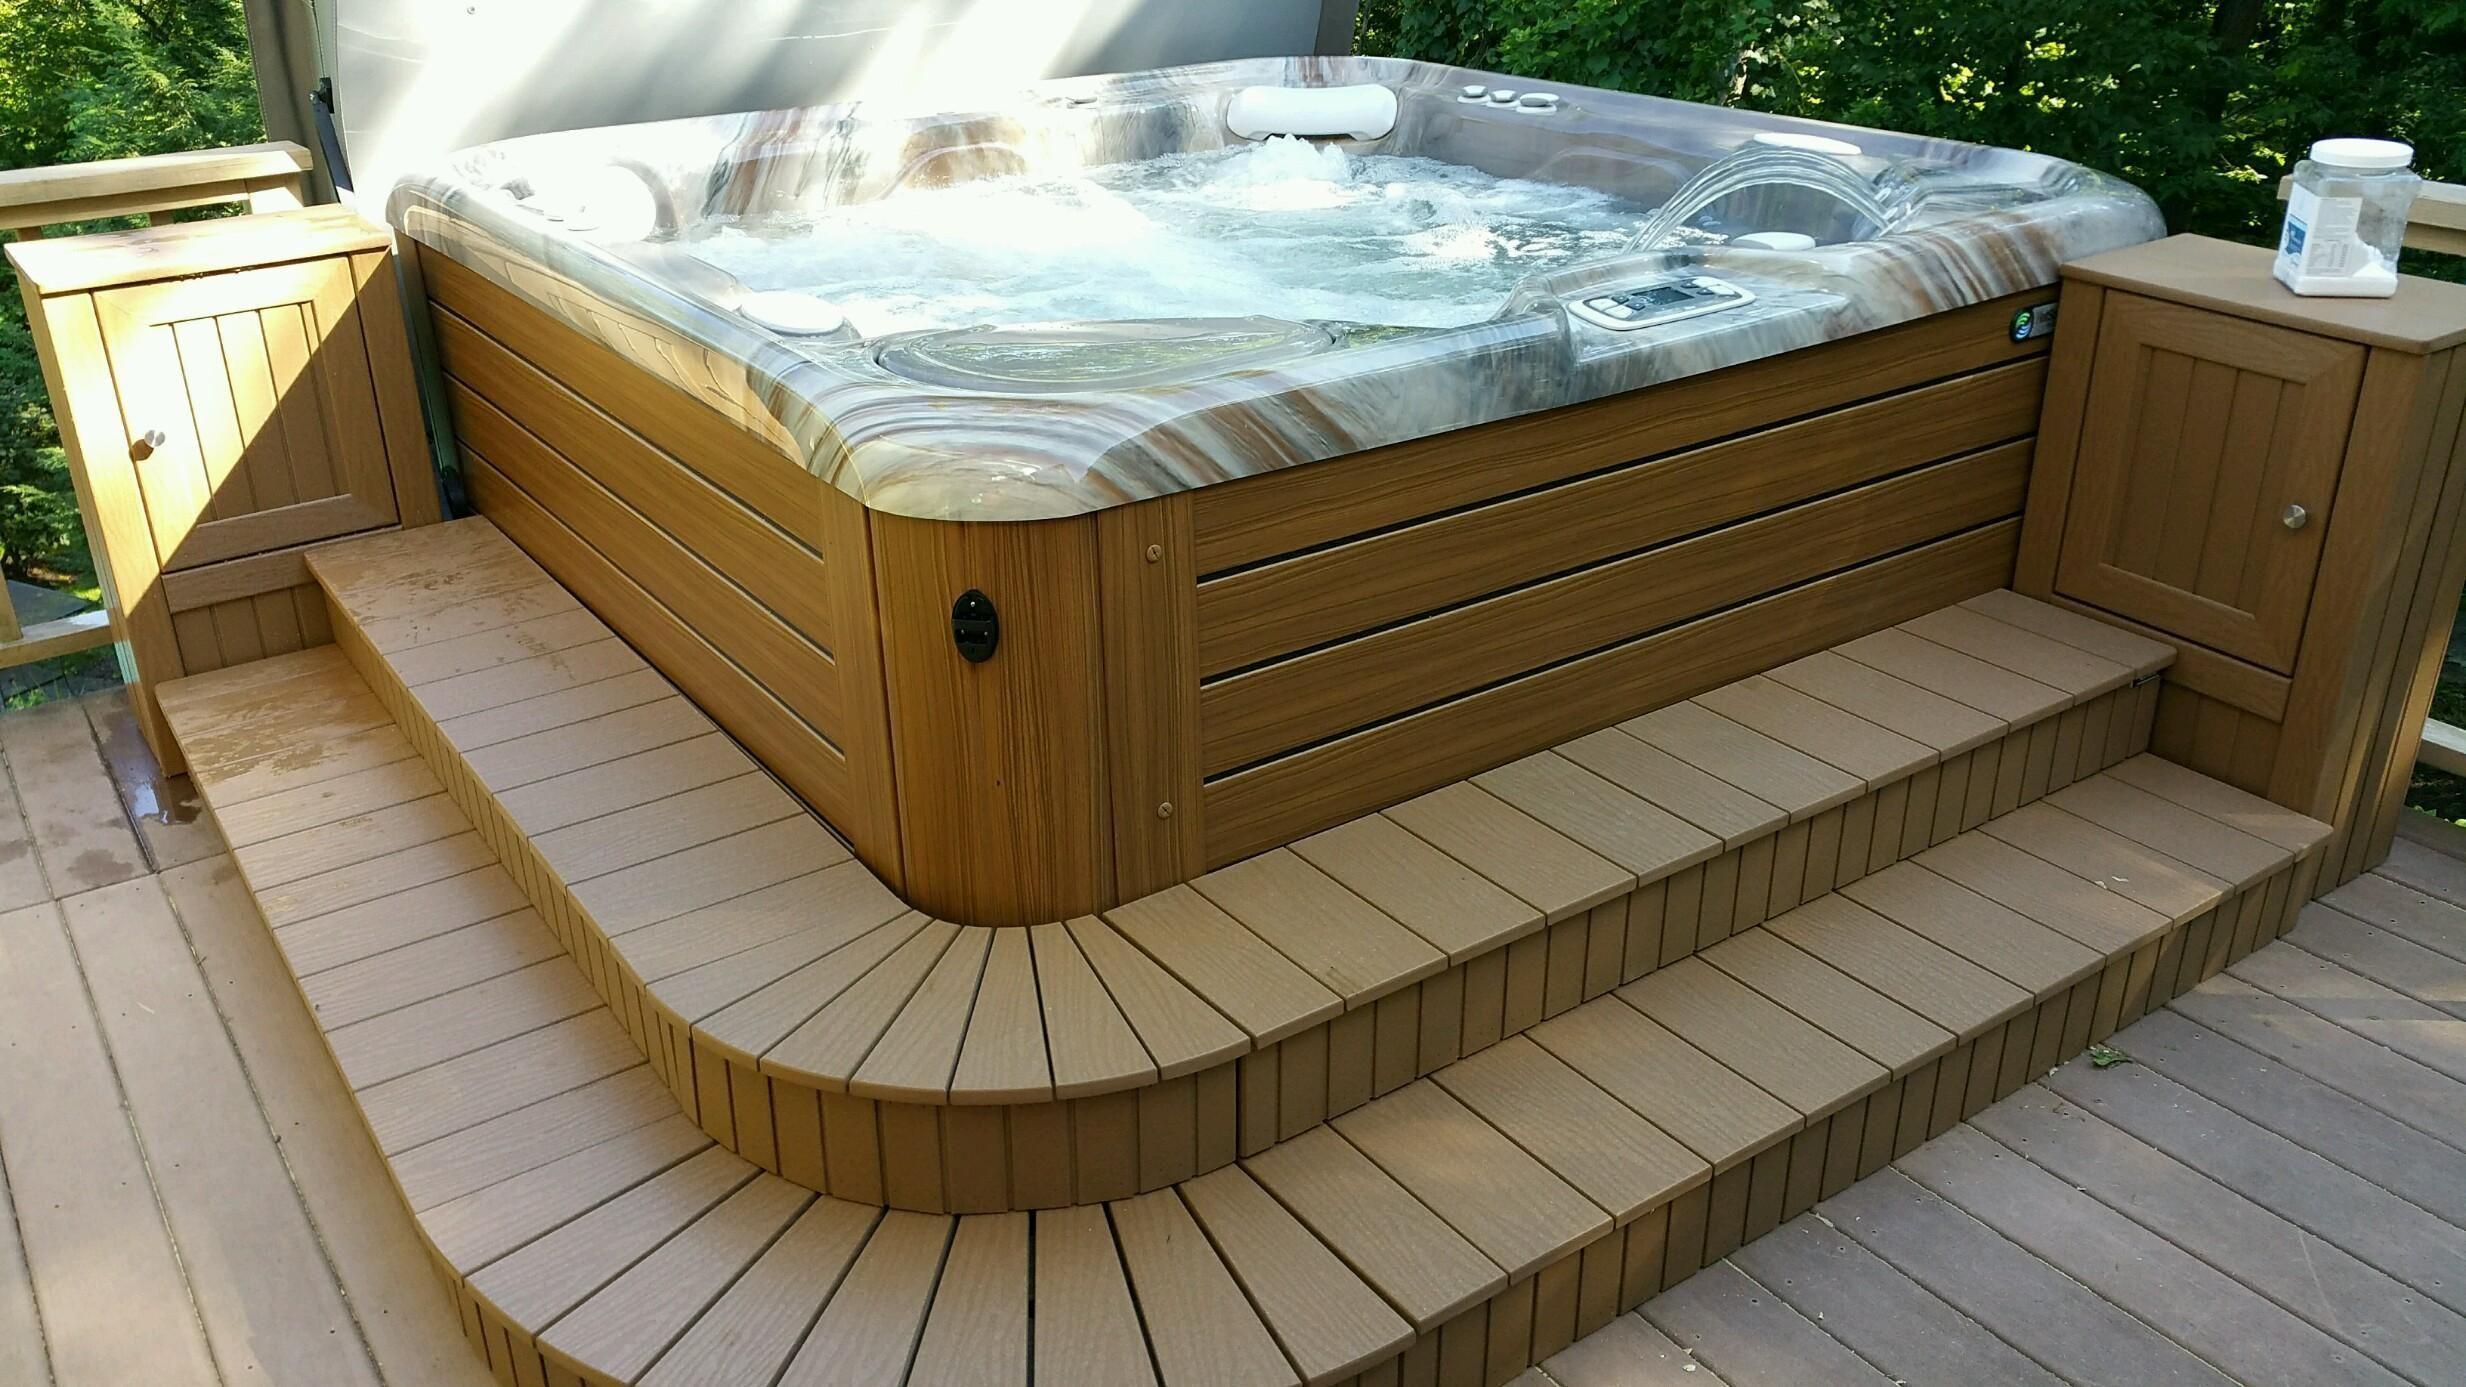 Image Result For Custom Hot Tub Steps Custom Hot Tubs Hot Tub